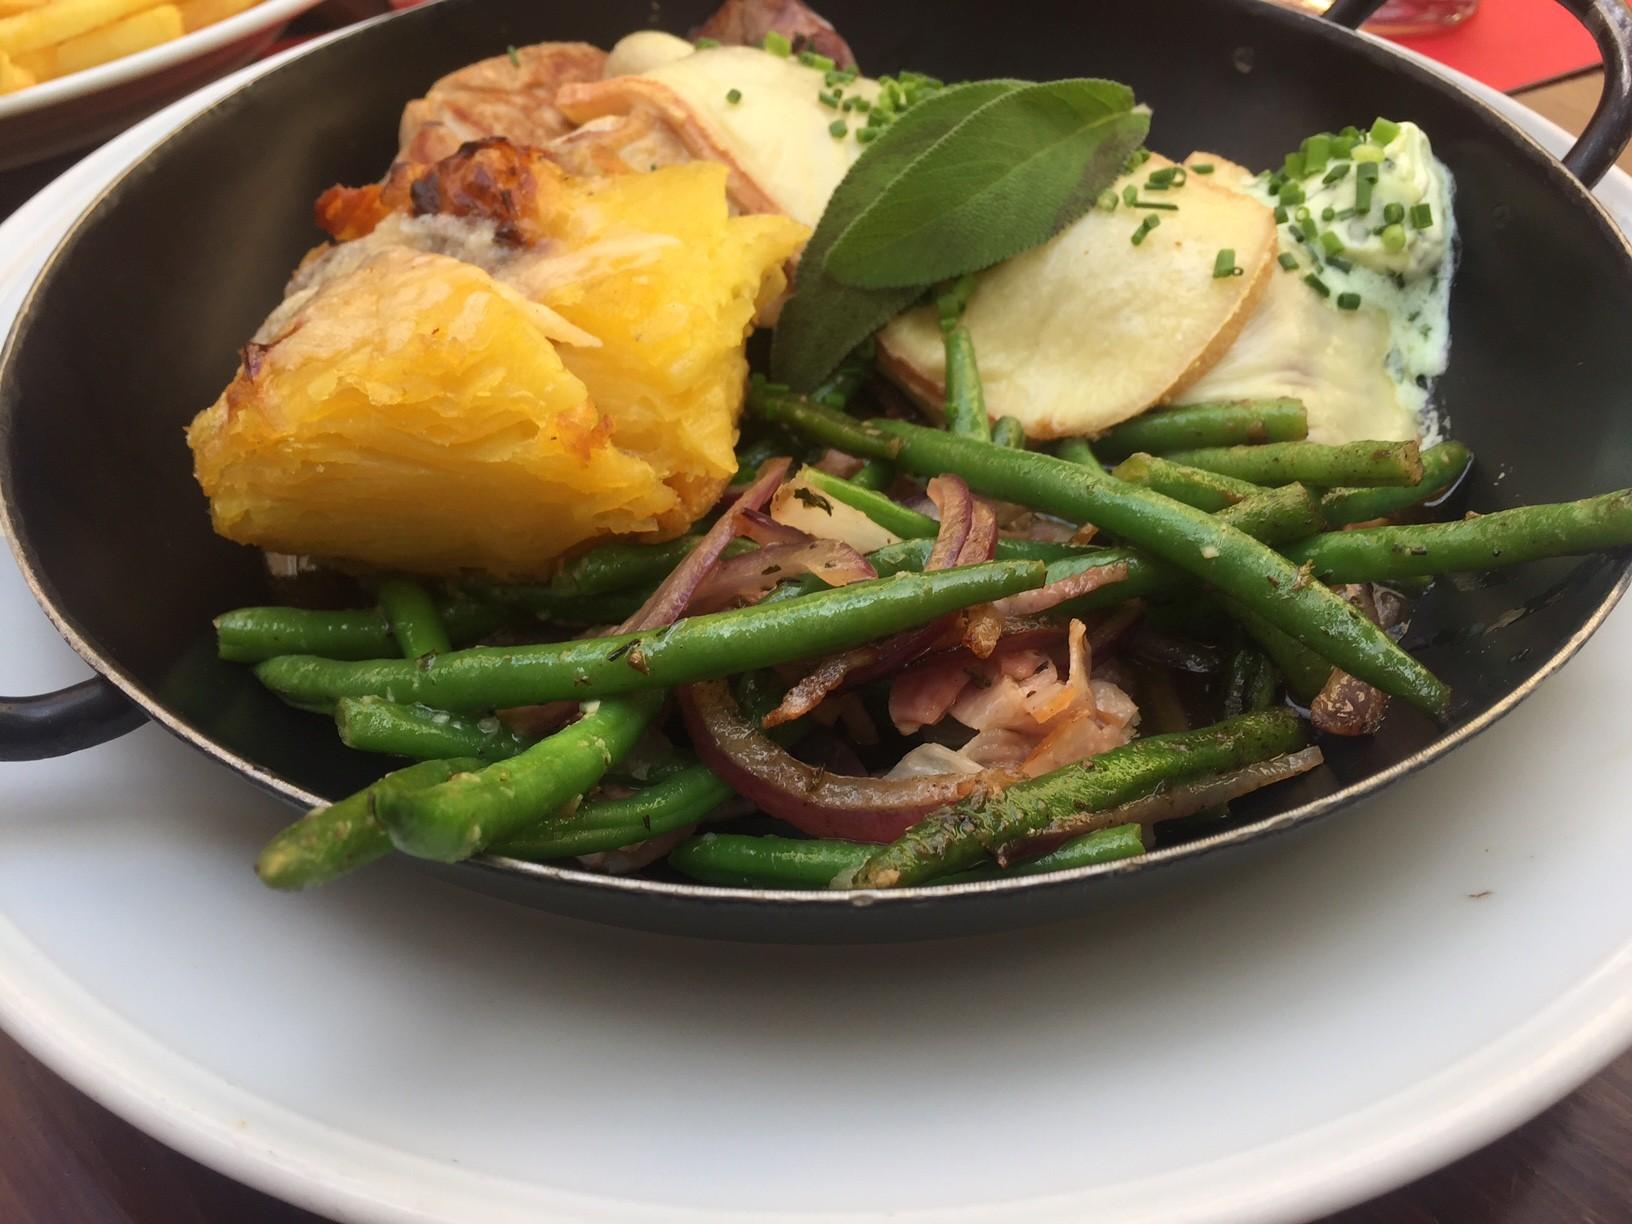 Foodie in Salzburg eettips en reistips op Foodblog Foodinista in Oostenrijk